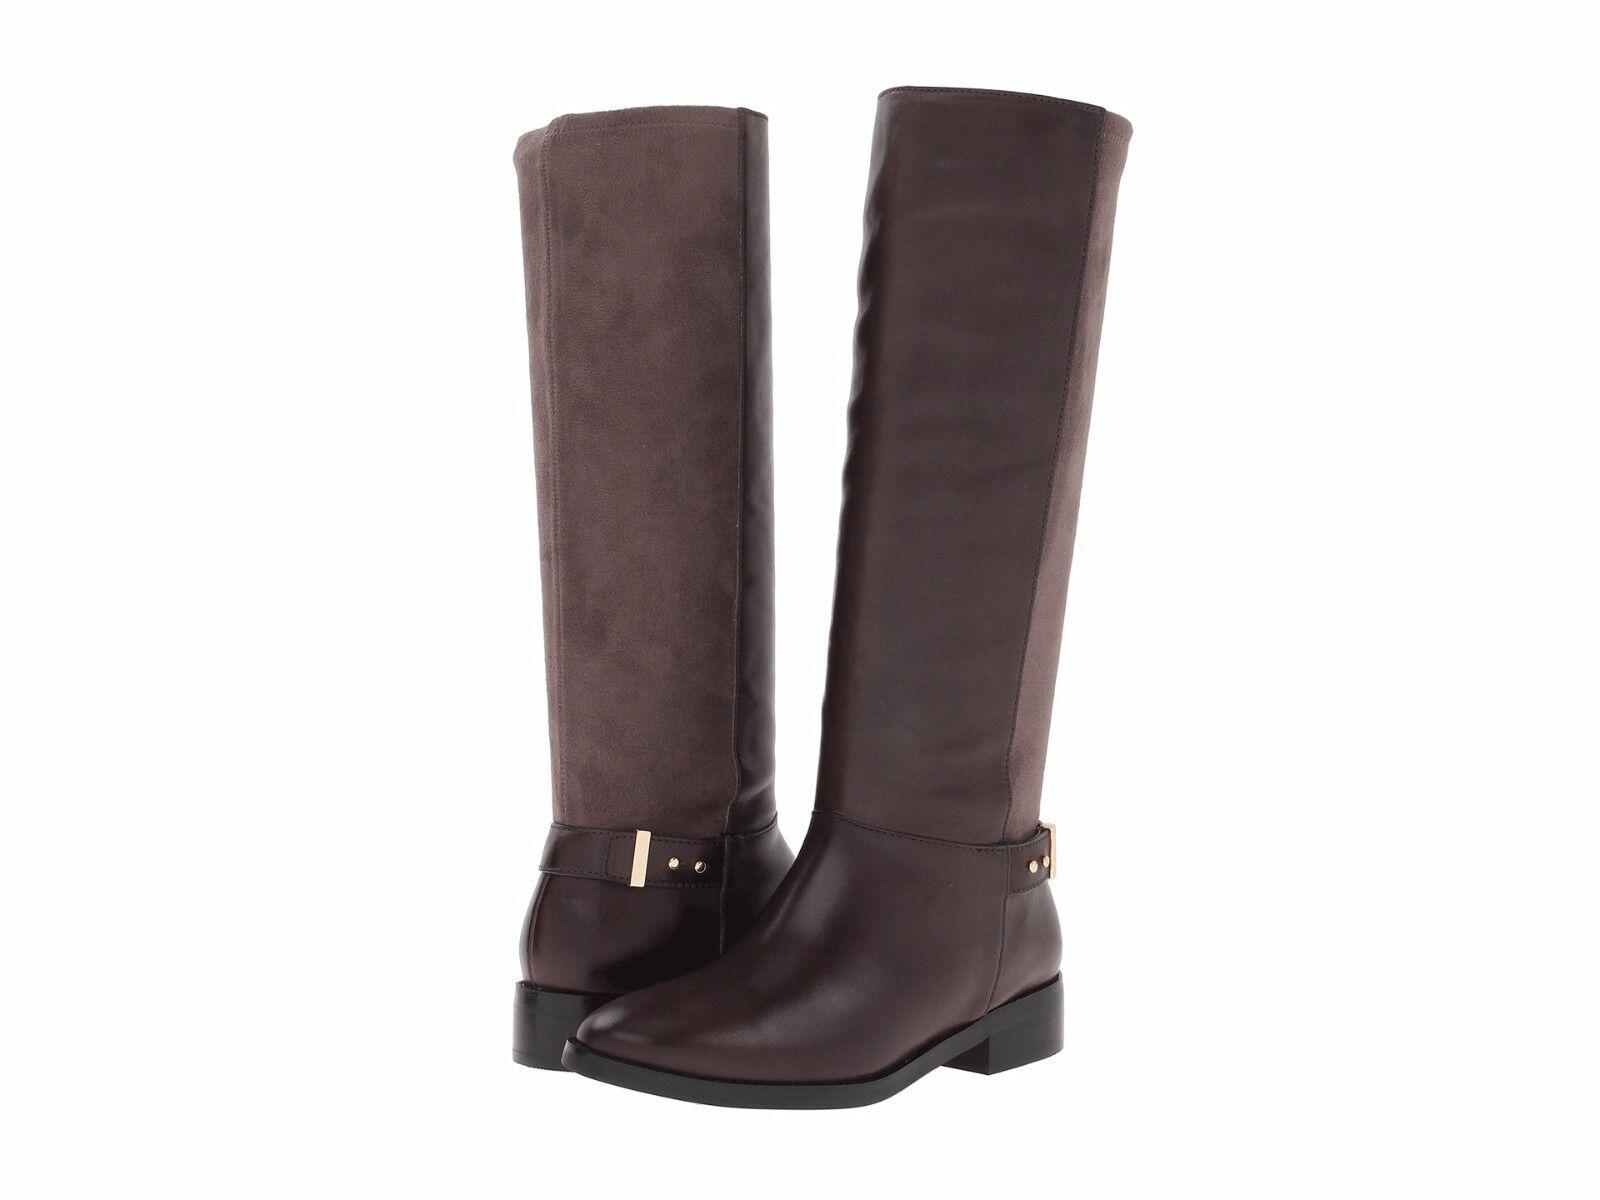 compra nuovo economico NWOB 378 COLE HAAN  ADLER  riding stivali,Marrone leather leather leather & suede, 7.5M, Chesnut  alta qualità